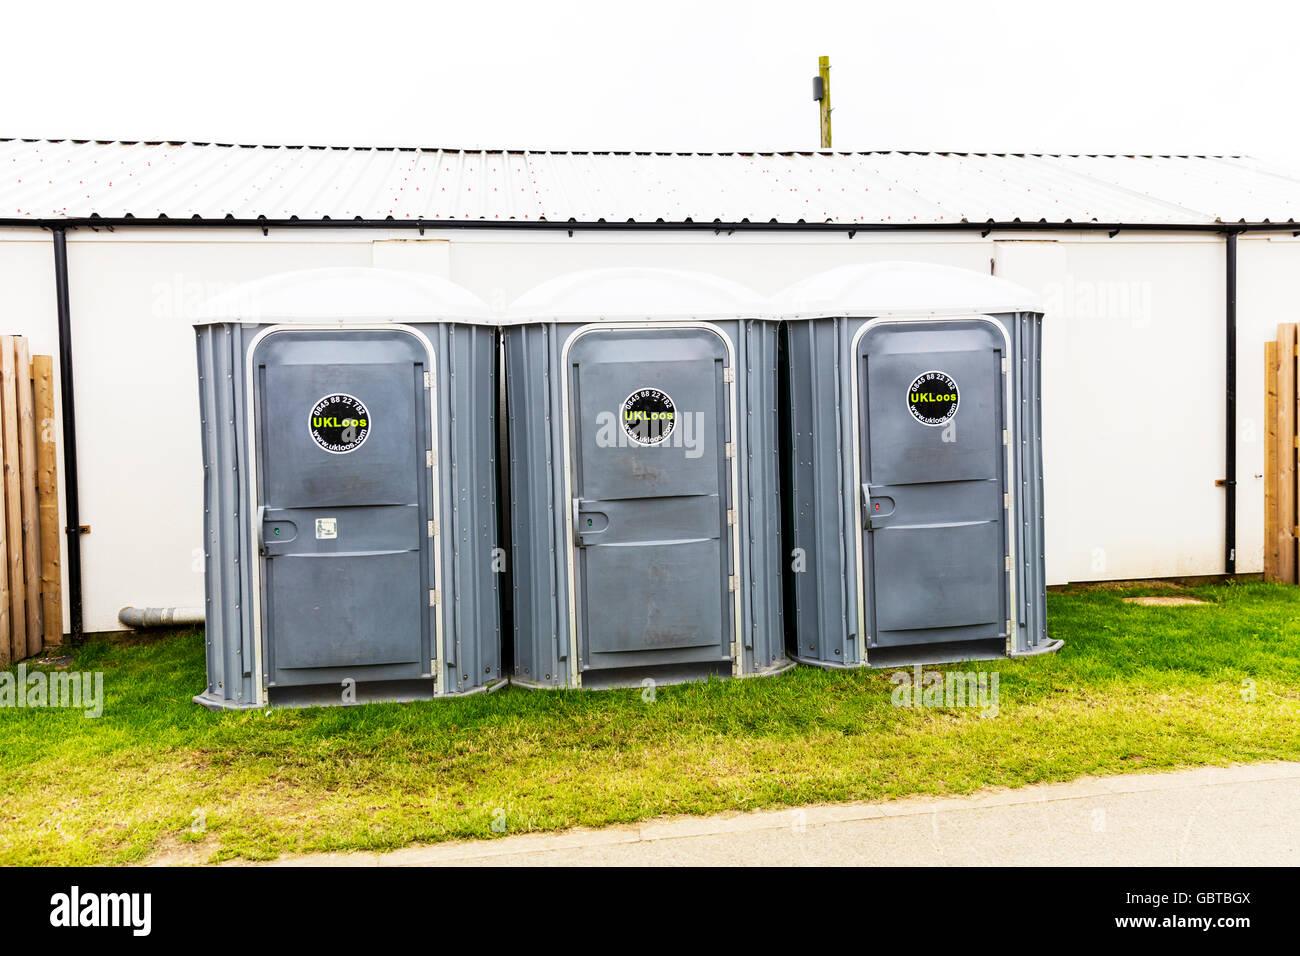 Portaloo porta loo loos cabin portakabin hire toilet toilets restroom restrooms UK England GB - Stock Image